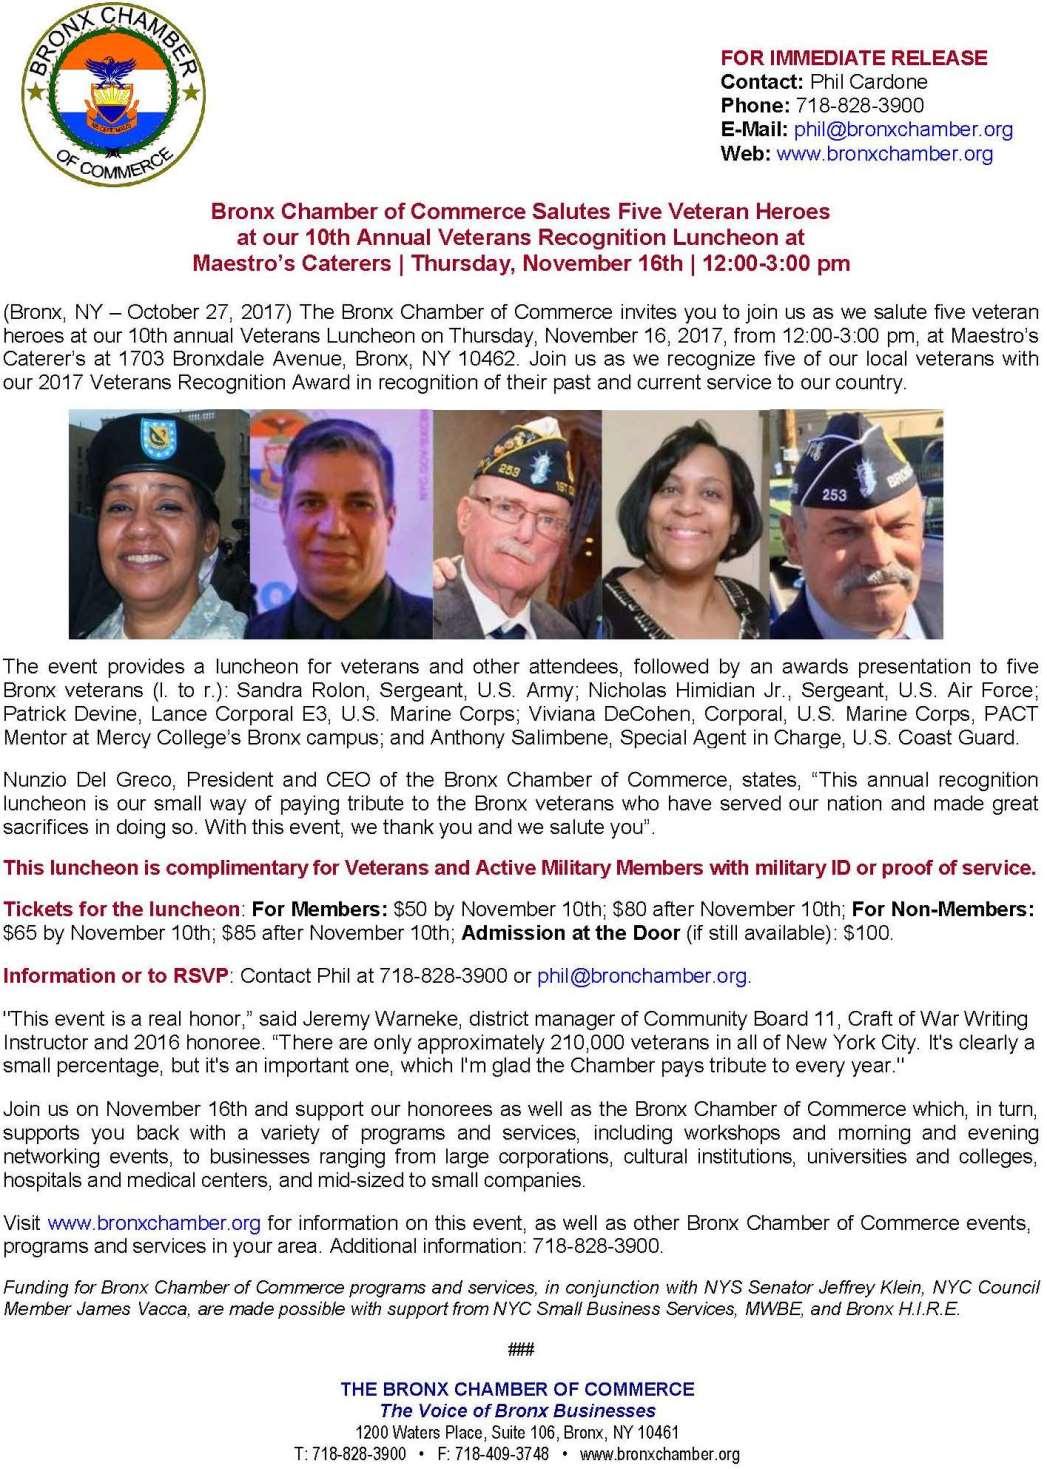 2017 Bronx Chamber Veterans Luncheon release